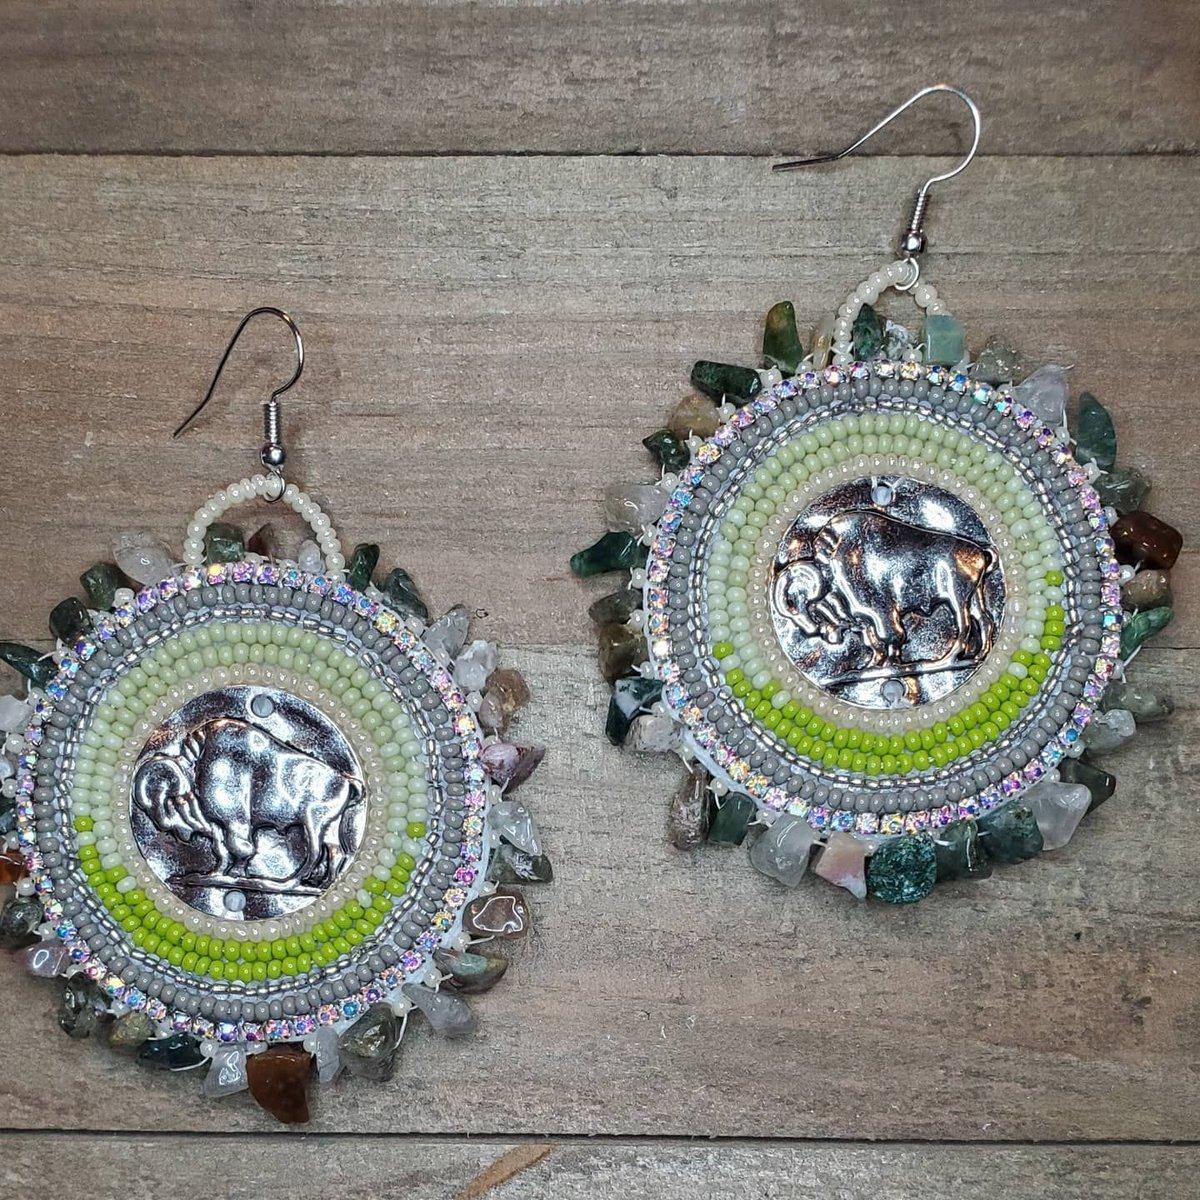 Wandering Buffalo beaded earrings with genuine jasper stones, FREE US shipping in my Etsy shop https://buff.ly/34tiaRC #NativeTwitter #AlaskaNative #FirstNations #Statimc #Unangax #Aleut #beadedearrings #beadwork #buynative #NativeMadepic.twitter.com/zG8F3MJzzZ